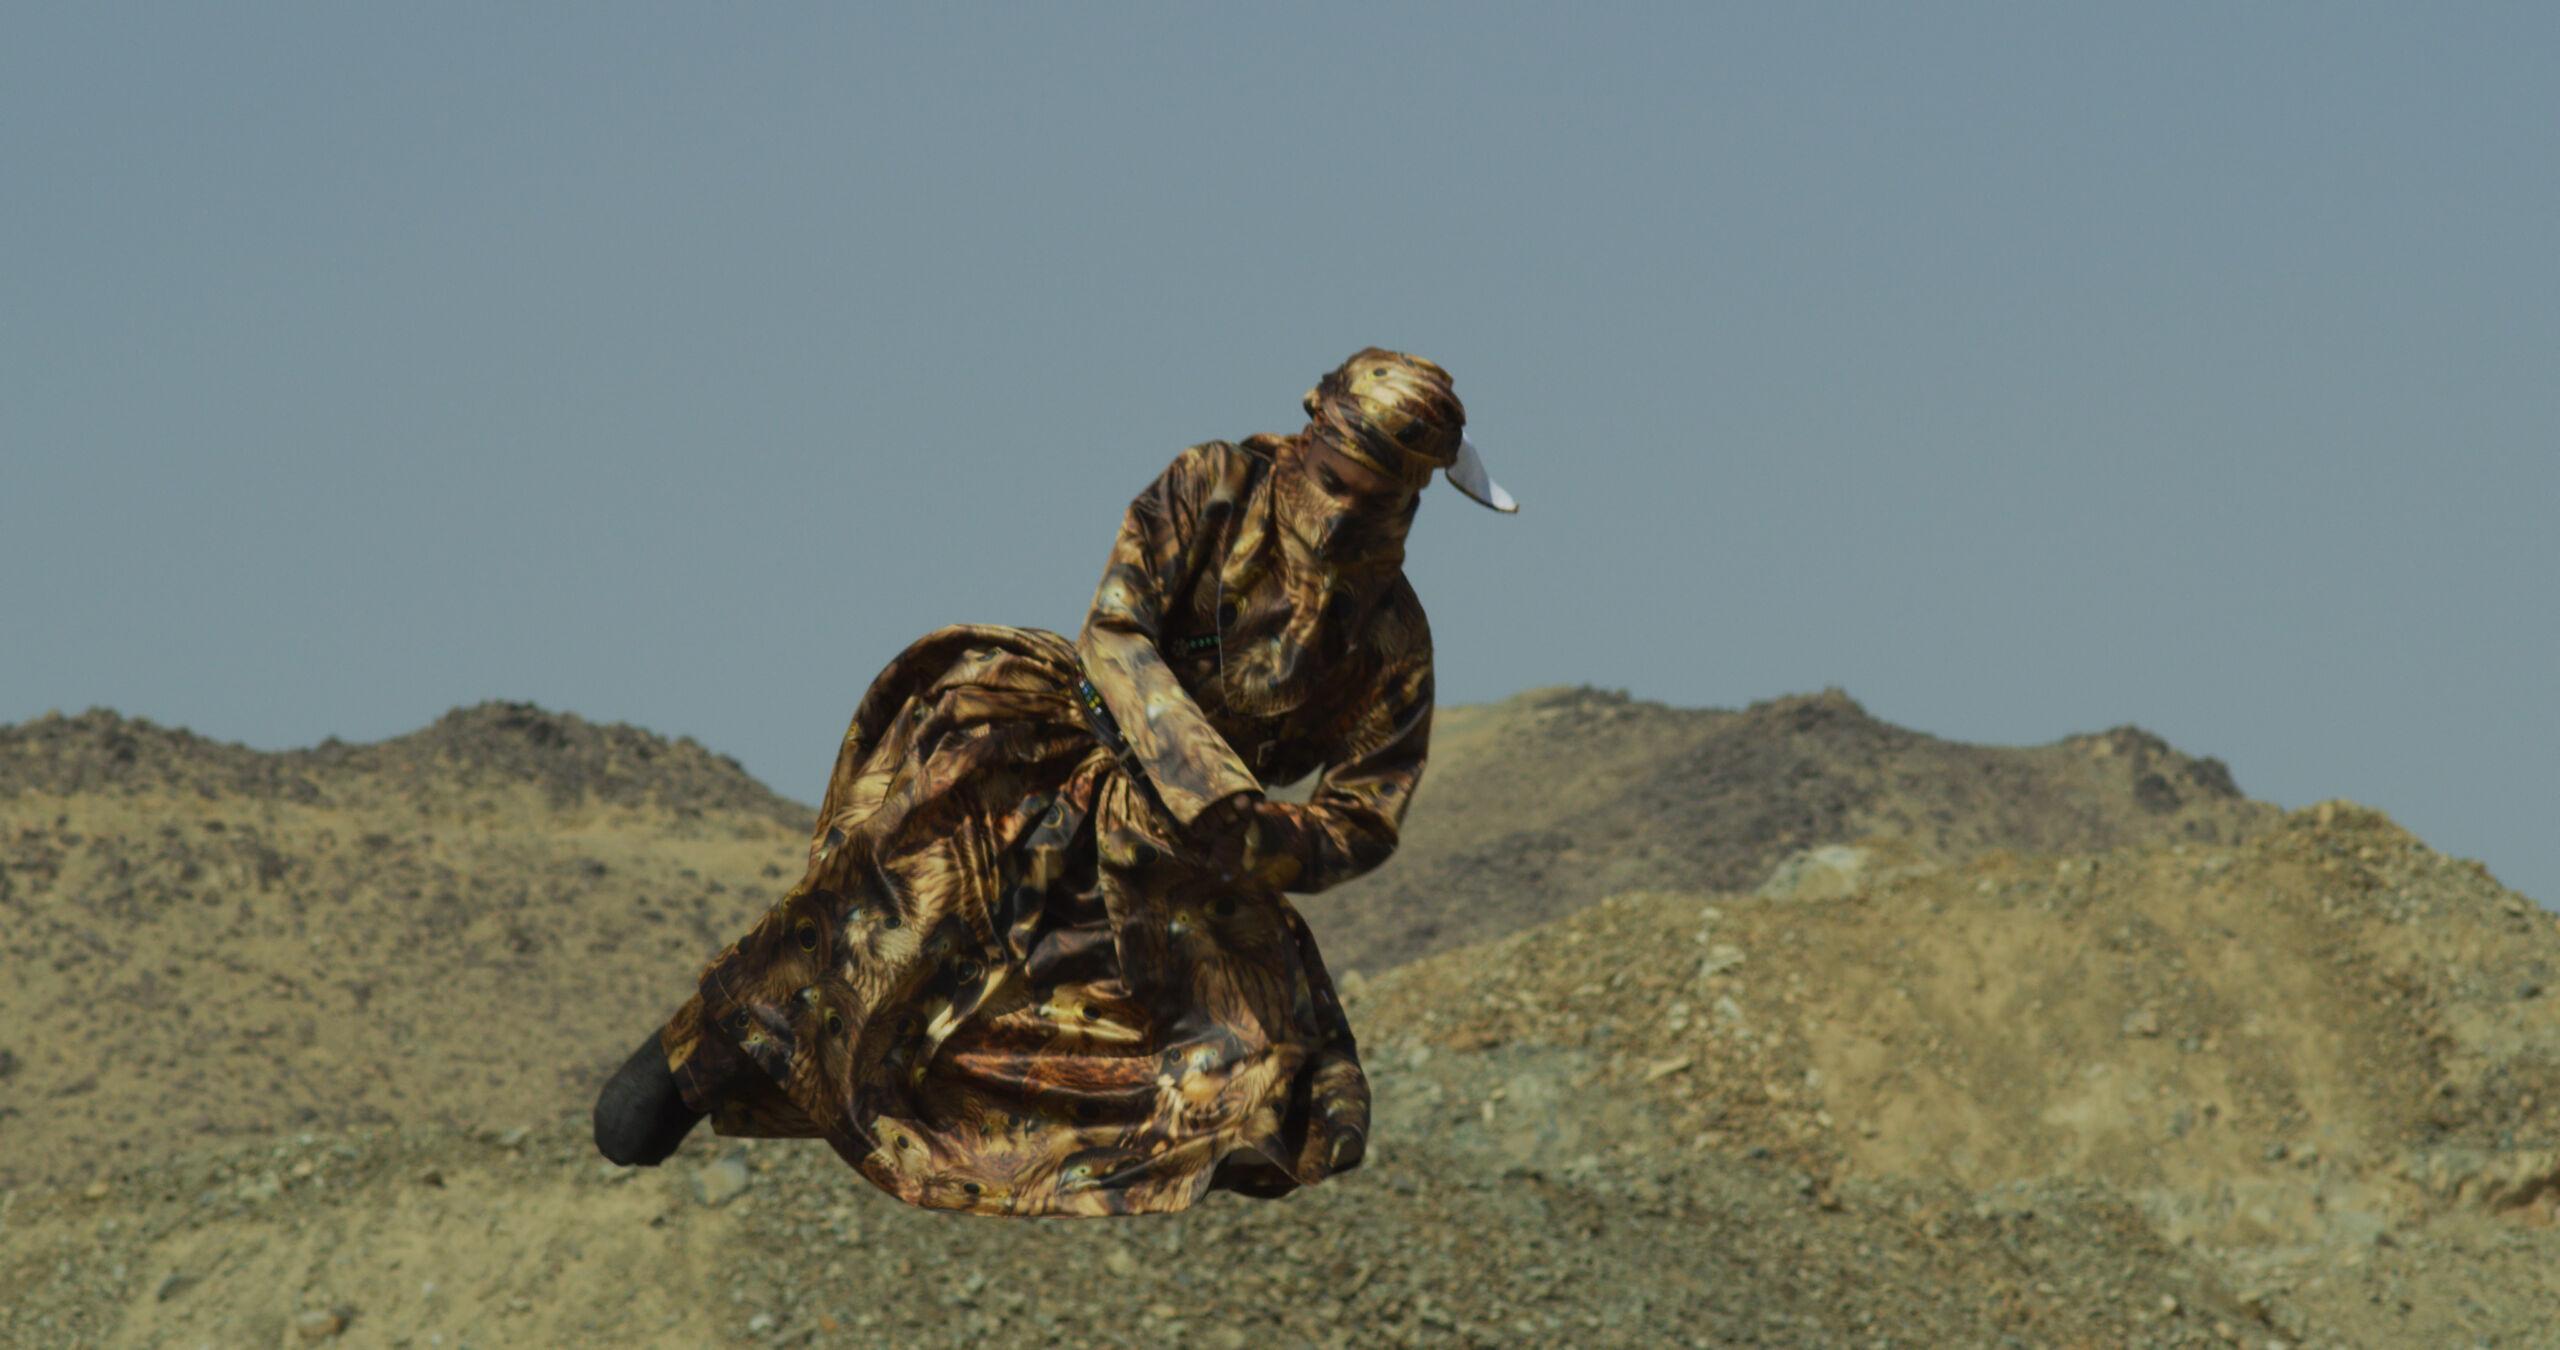 elaborately dressed figure in the desert